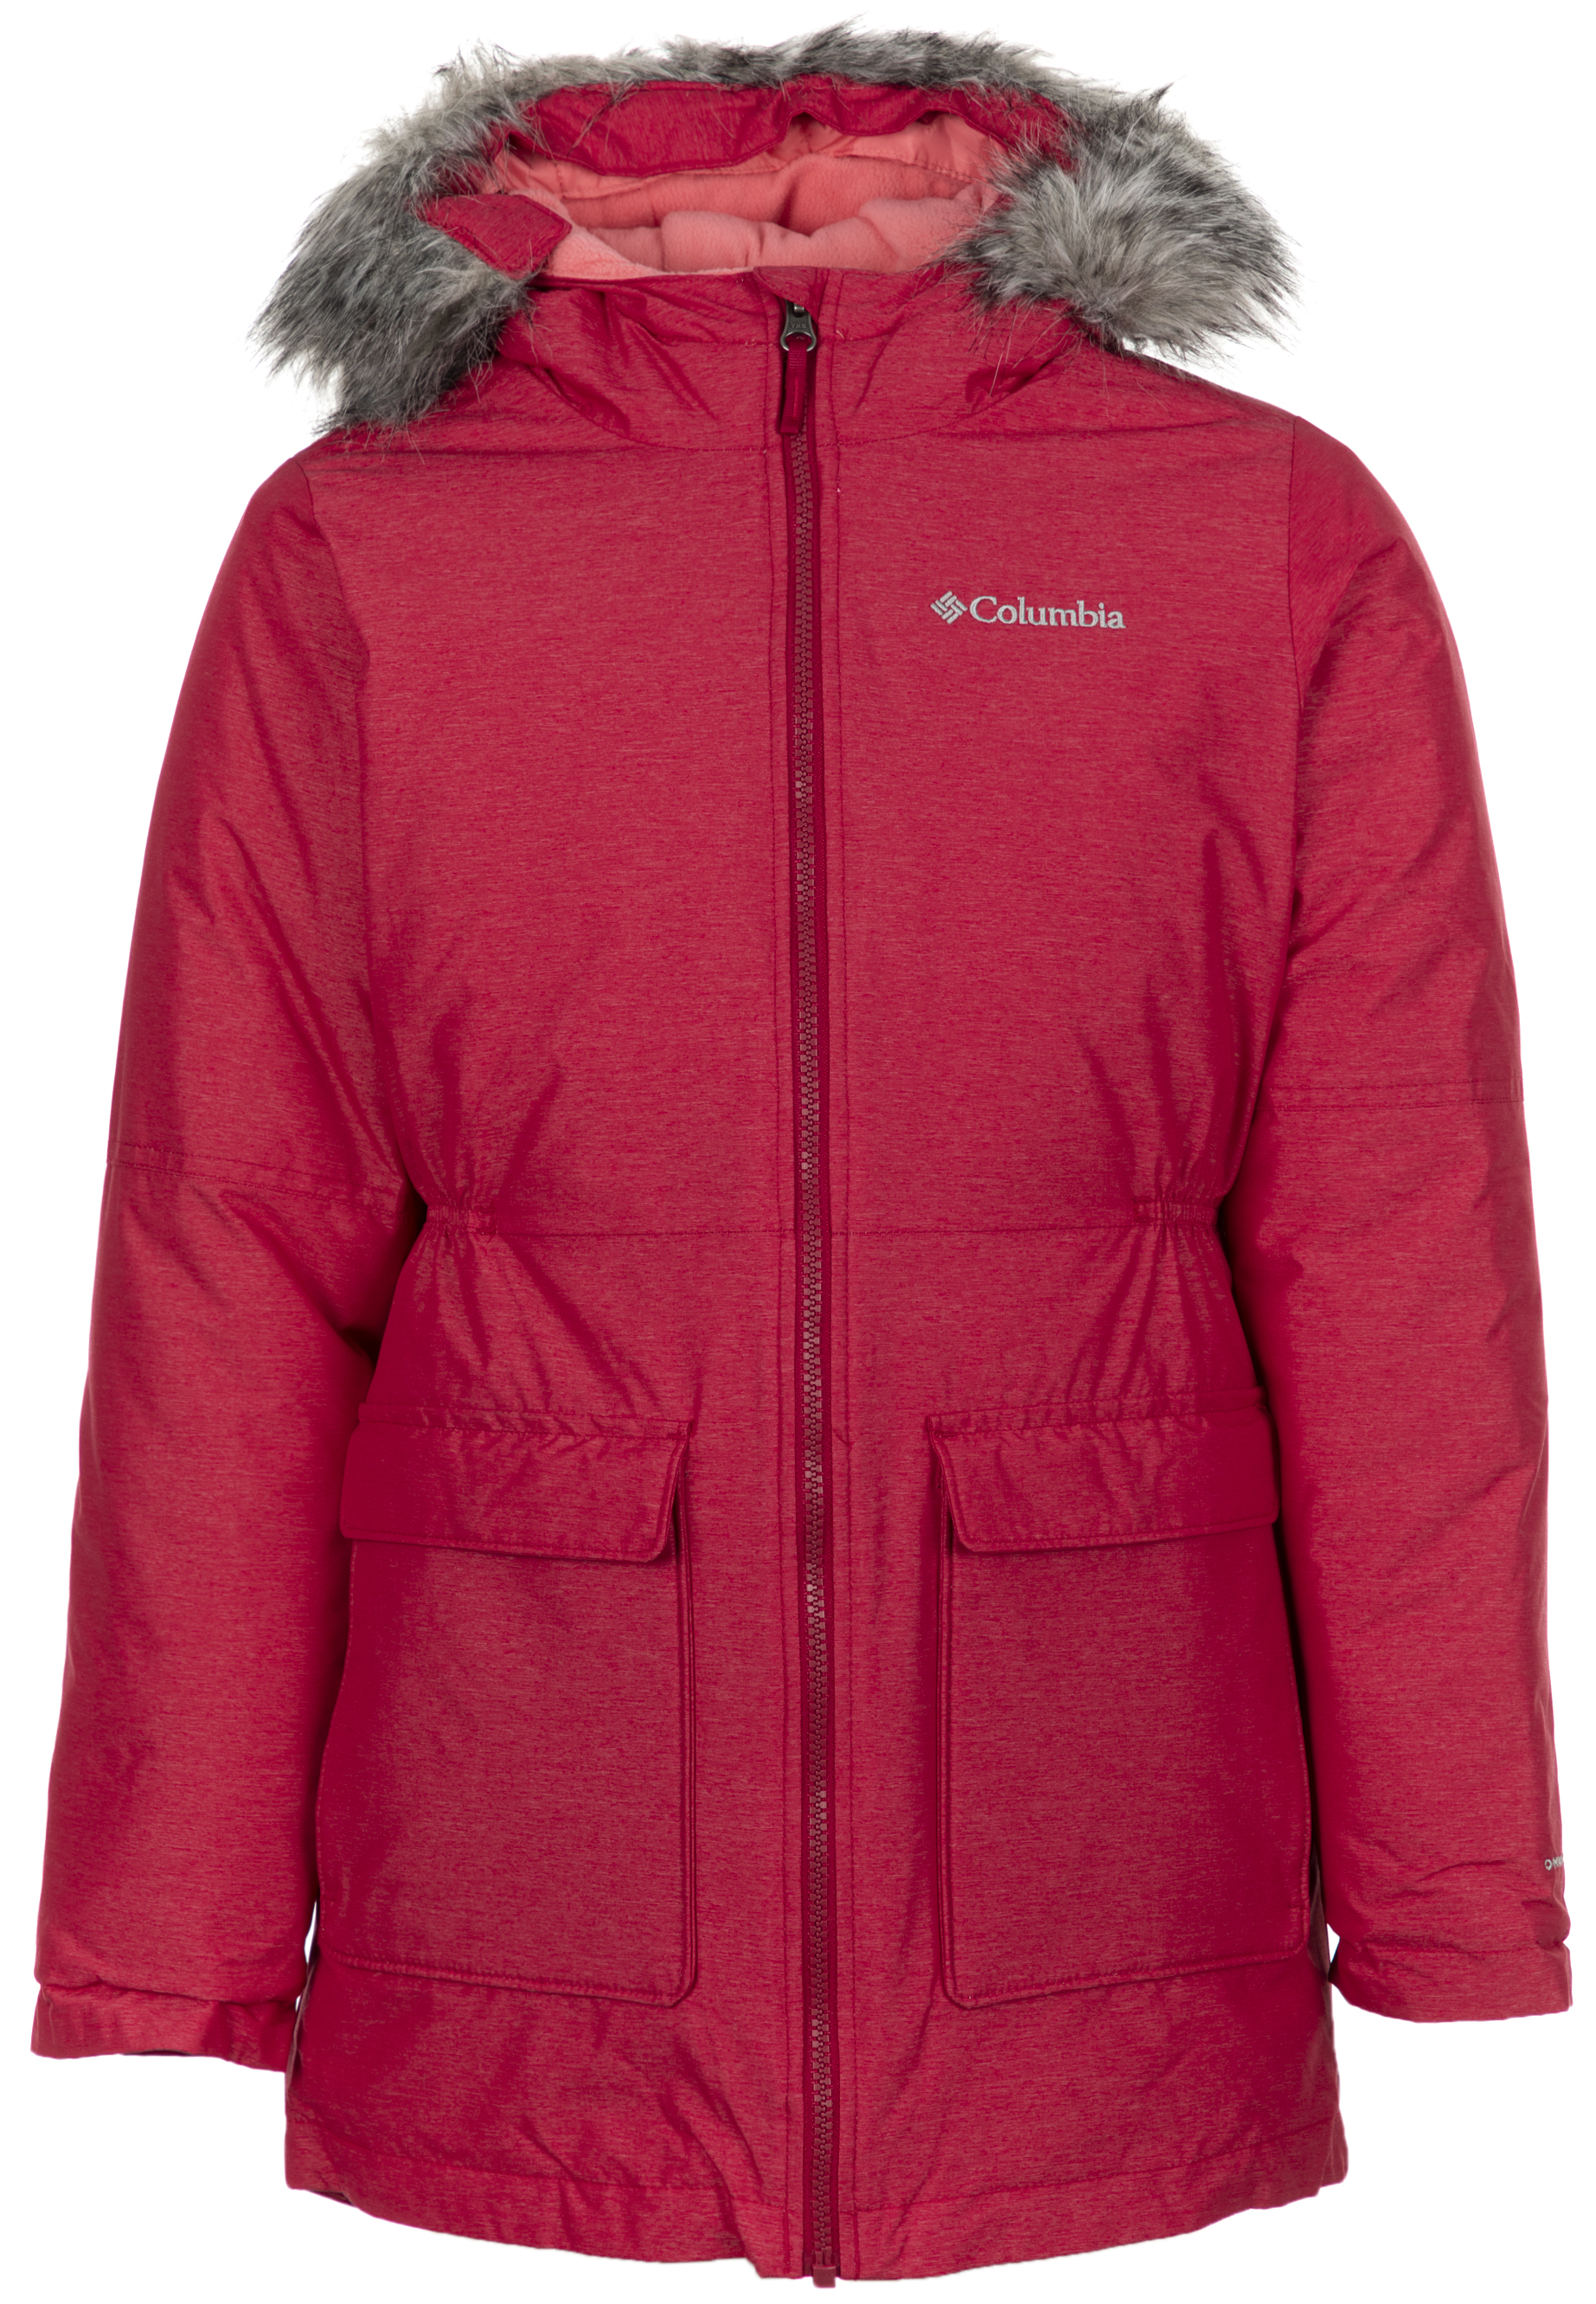 Columbia Куртка утепленная для девочек Columbia Siberian Sky, размер 160-170